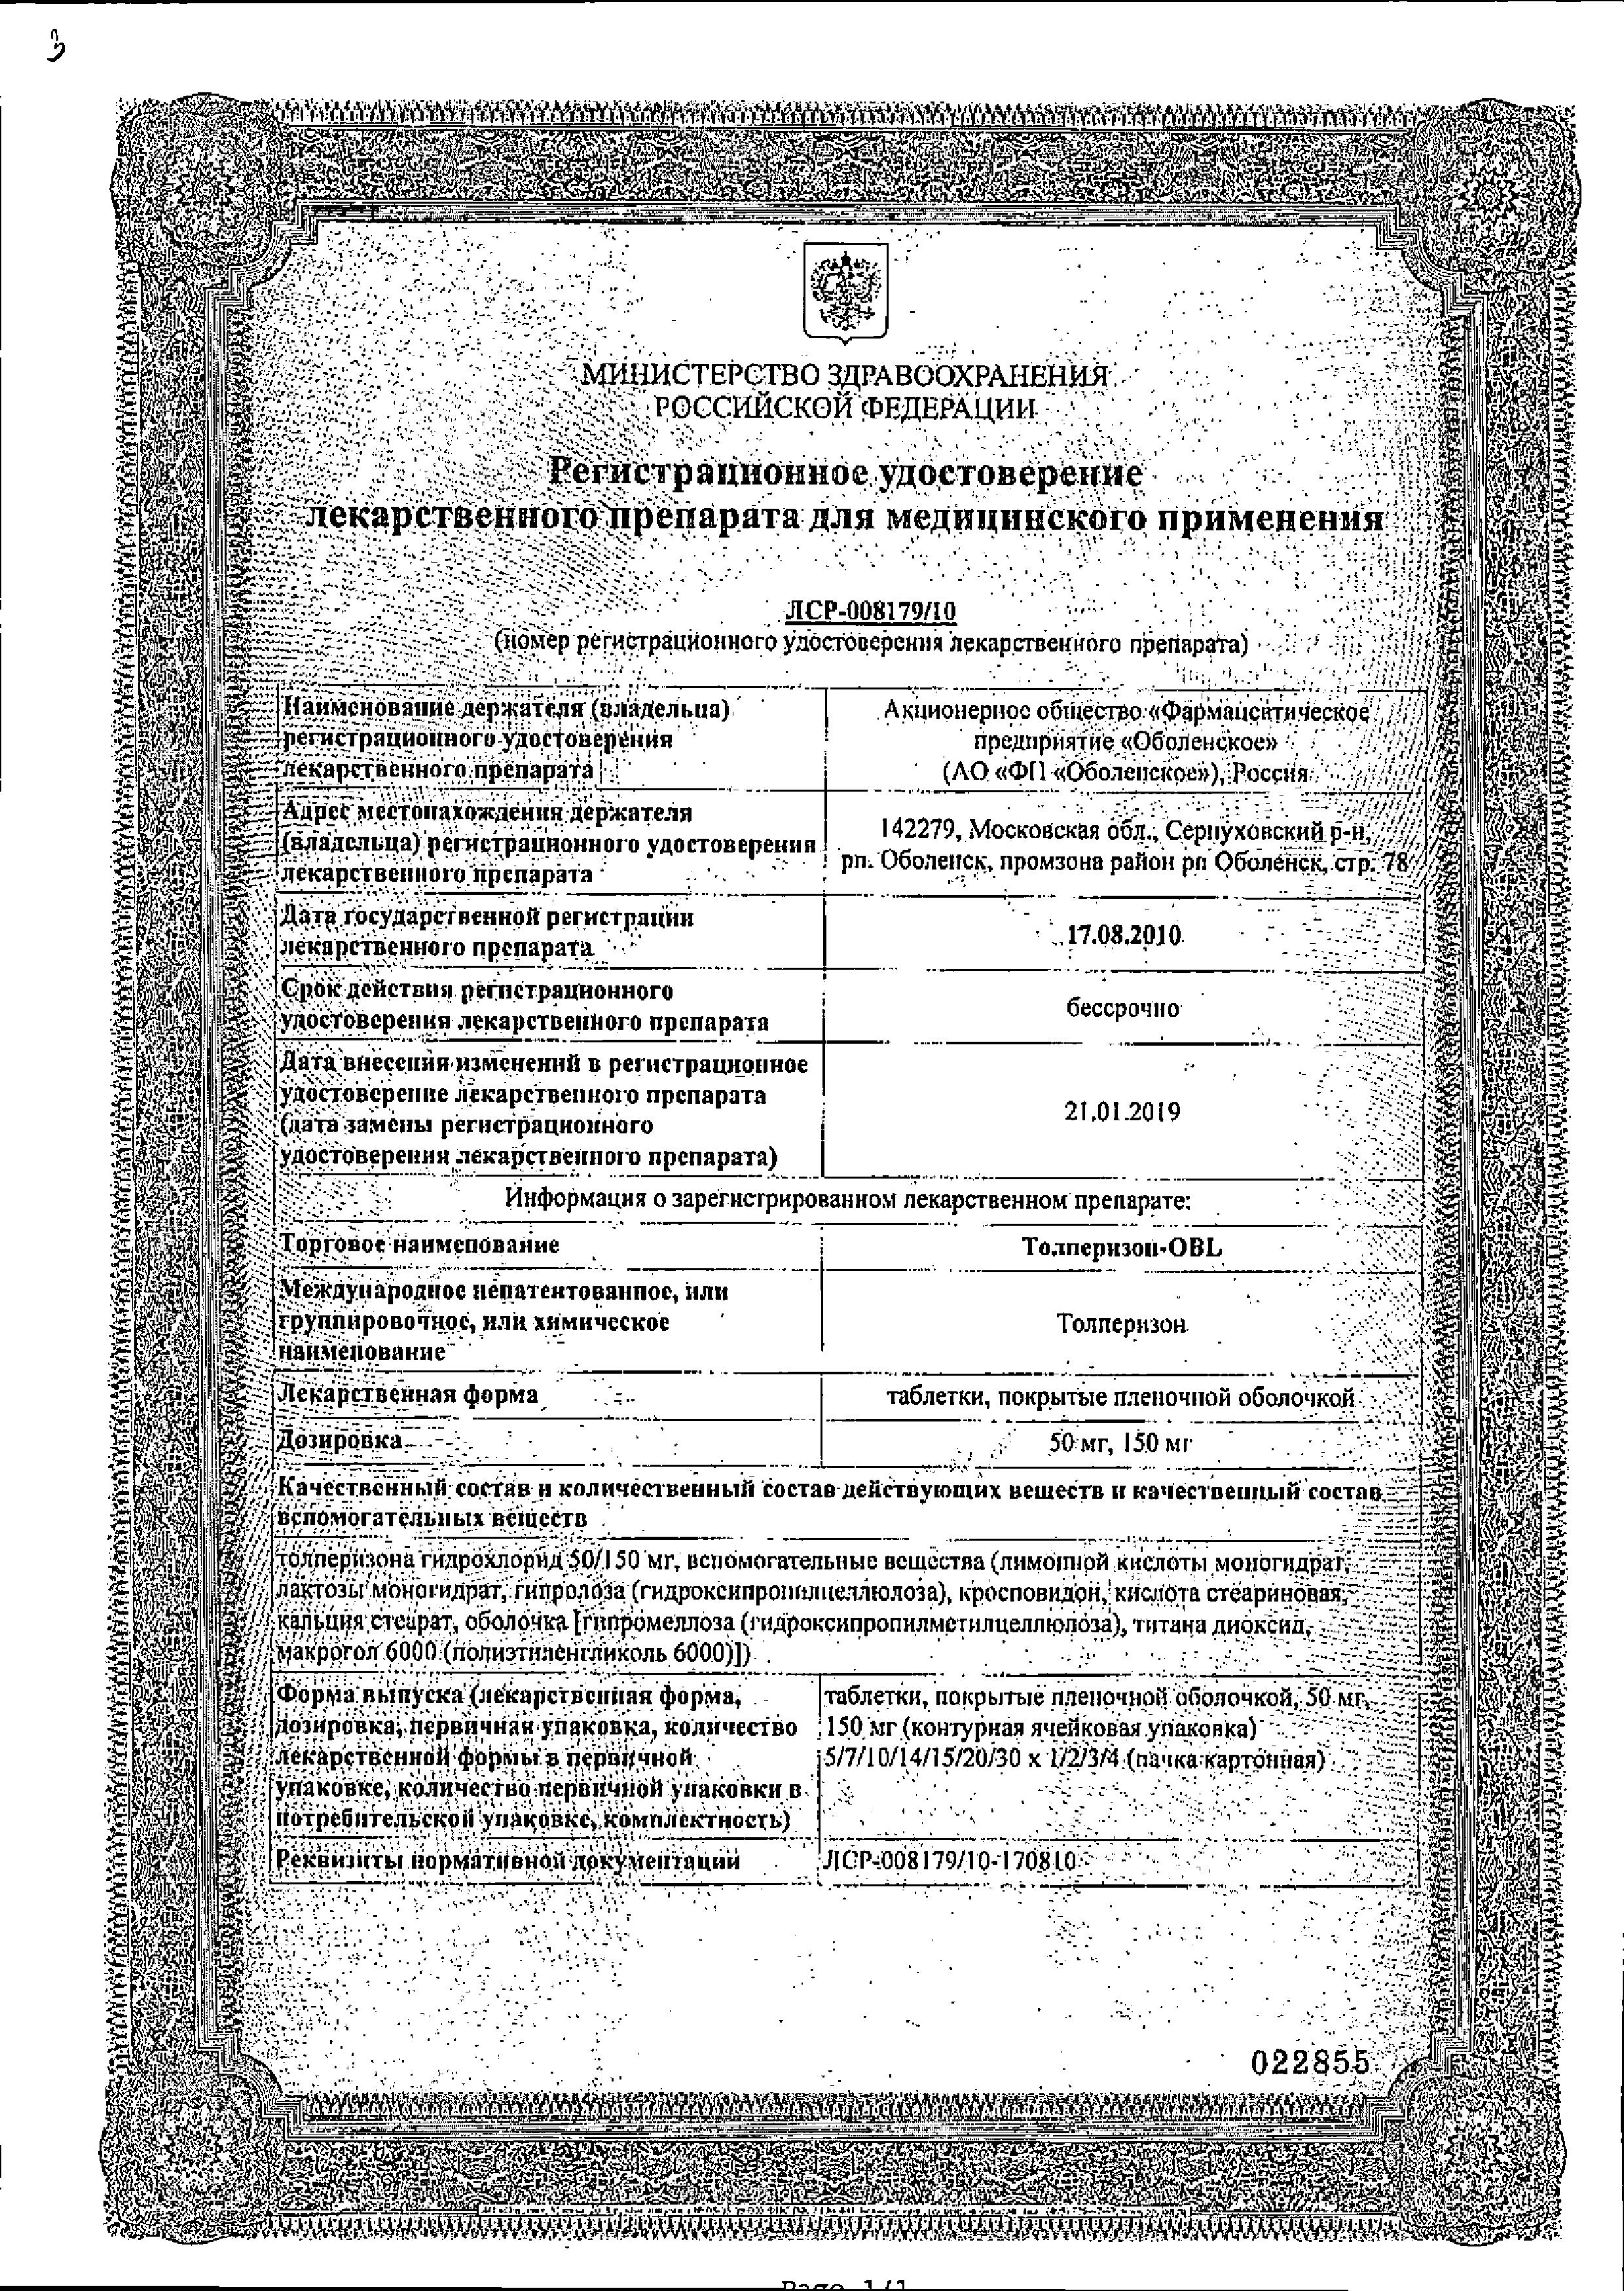 Толперизон-OBL сертификат